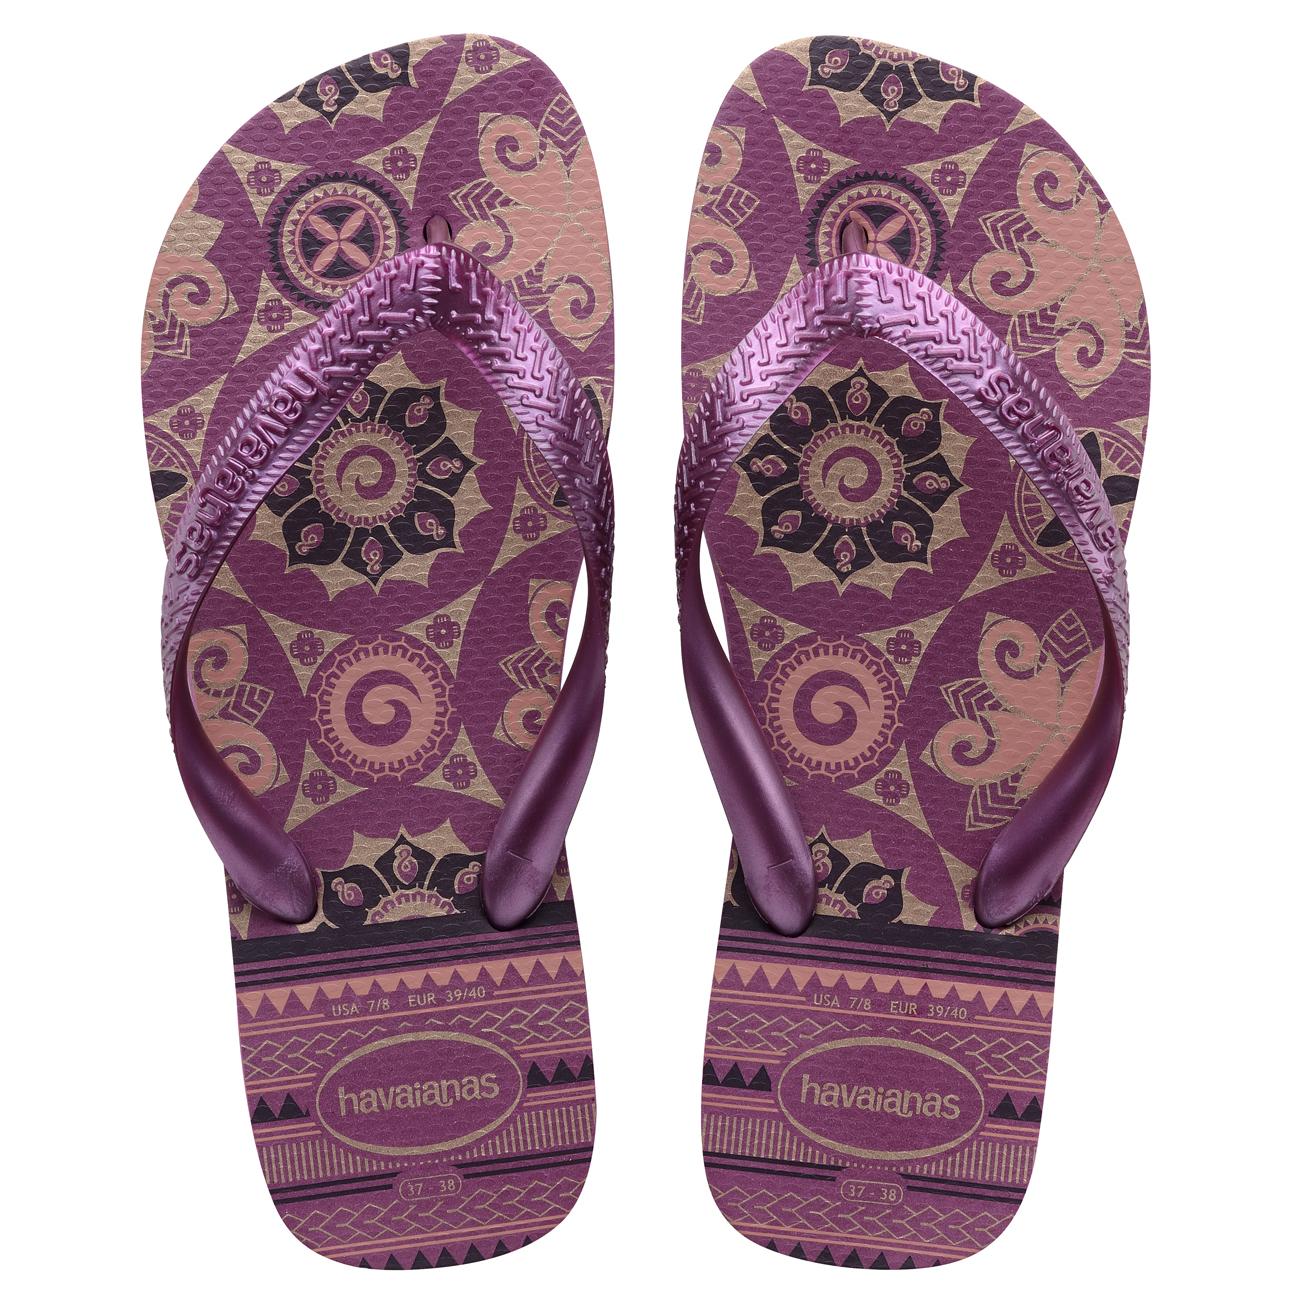 462f6cd240b8 Ladies Havaianas Spring Sandal Beach Thong Toe Post Holiday Flip Flops All  Sizes